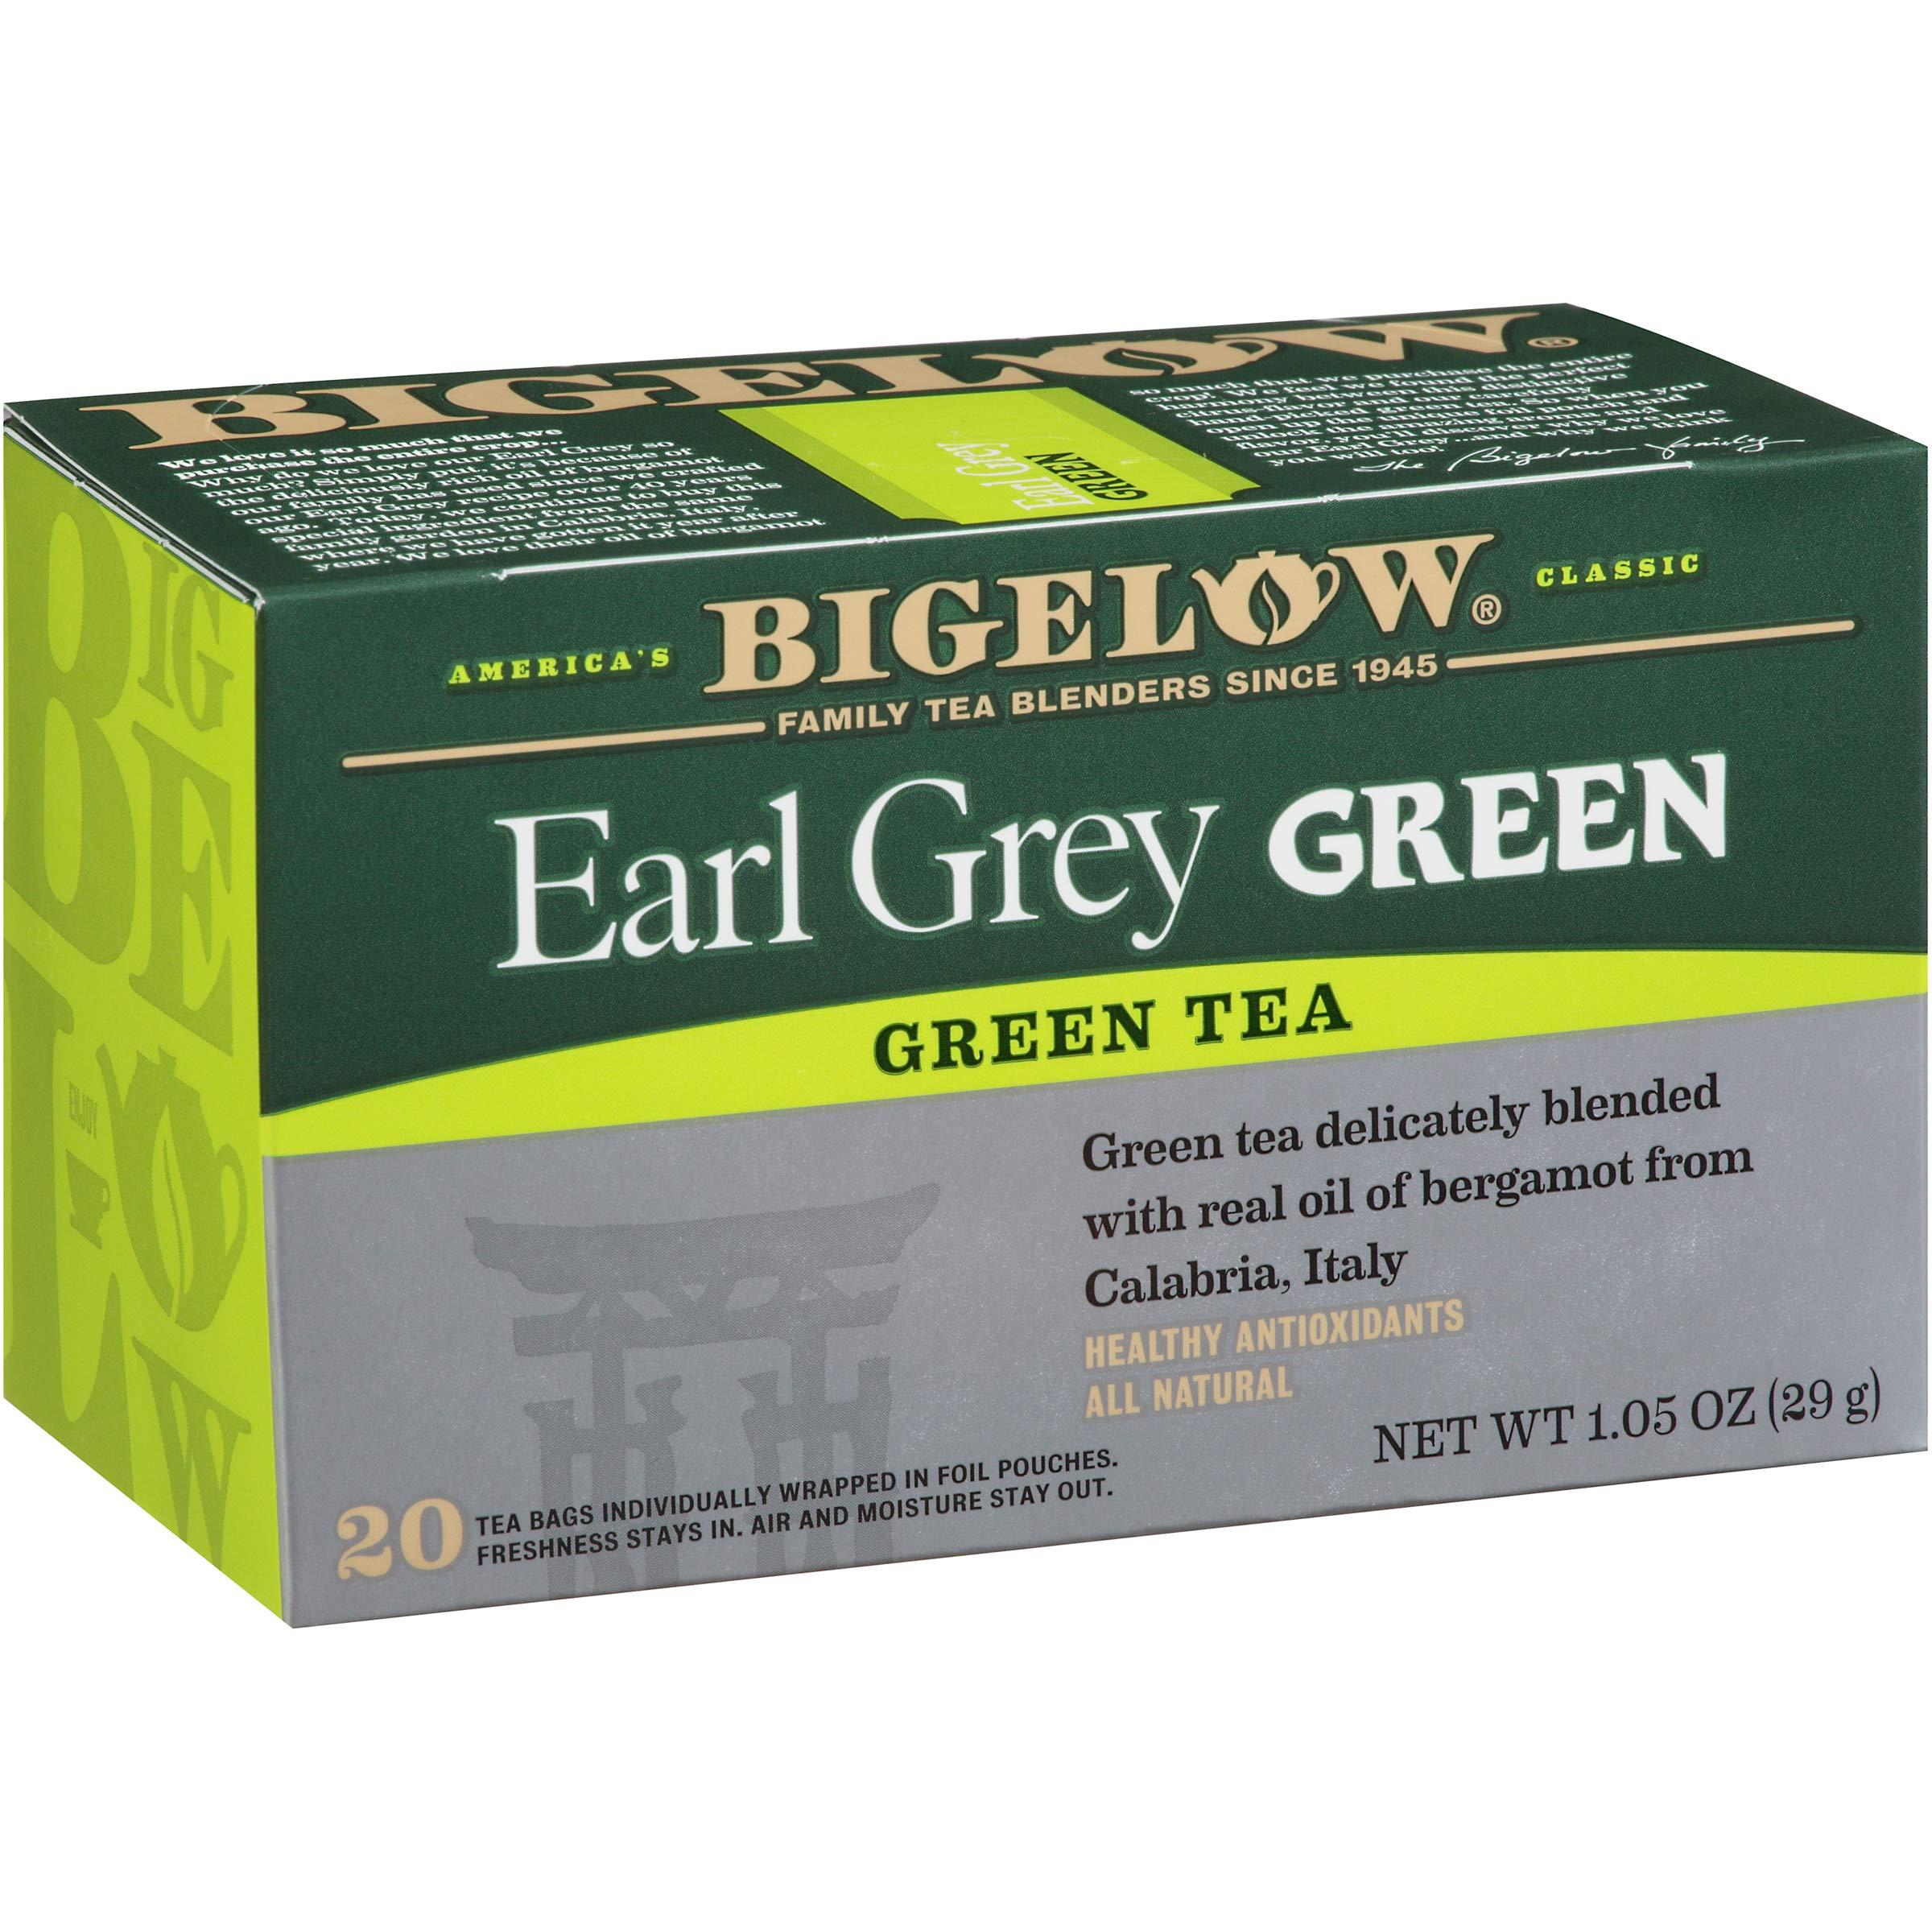 Bigelow Earl Grey Green Tea Caffeinated Individual Green Tea Bags, for Hot Tea or Iced Tea, 20 Count (Pack of 6), 120 Tea Bags Total. by Bigelow